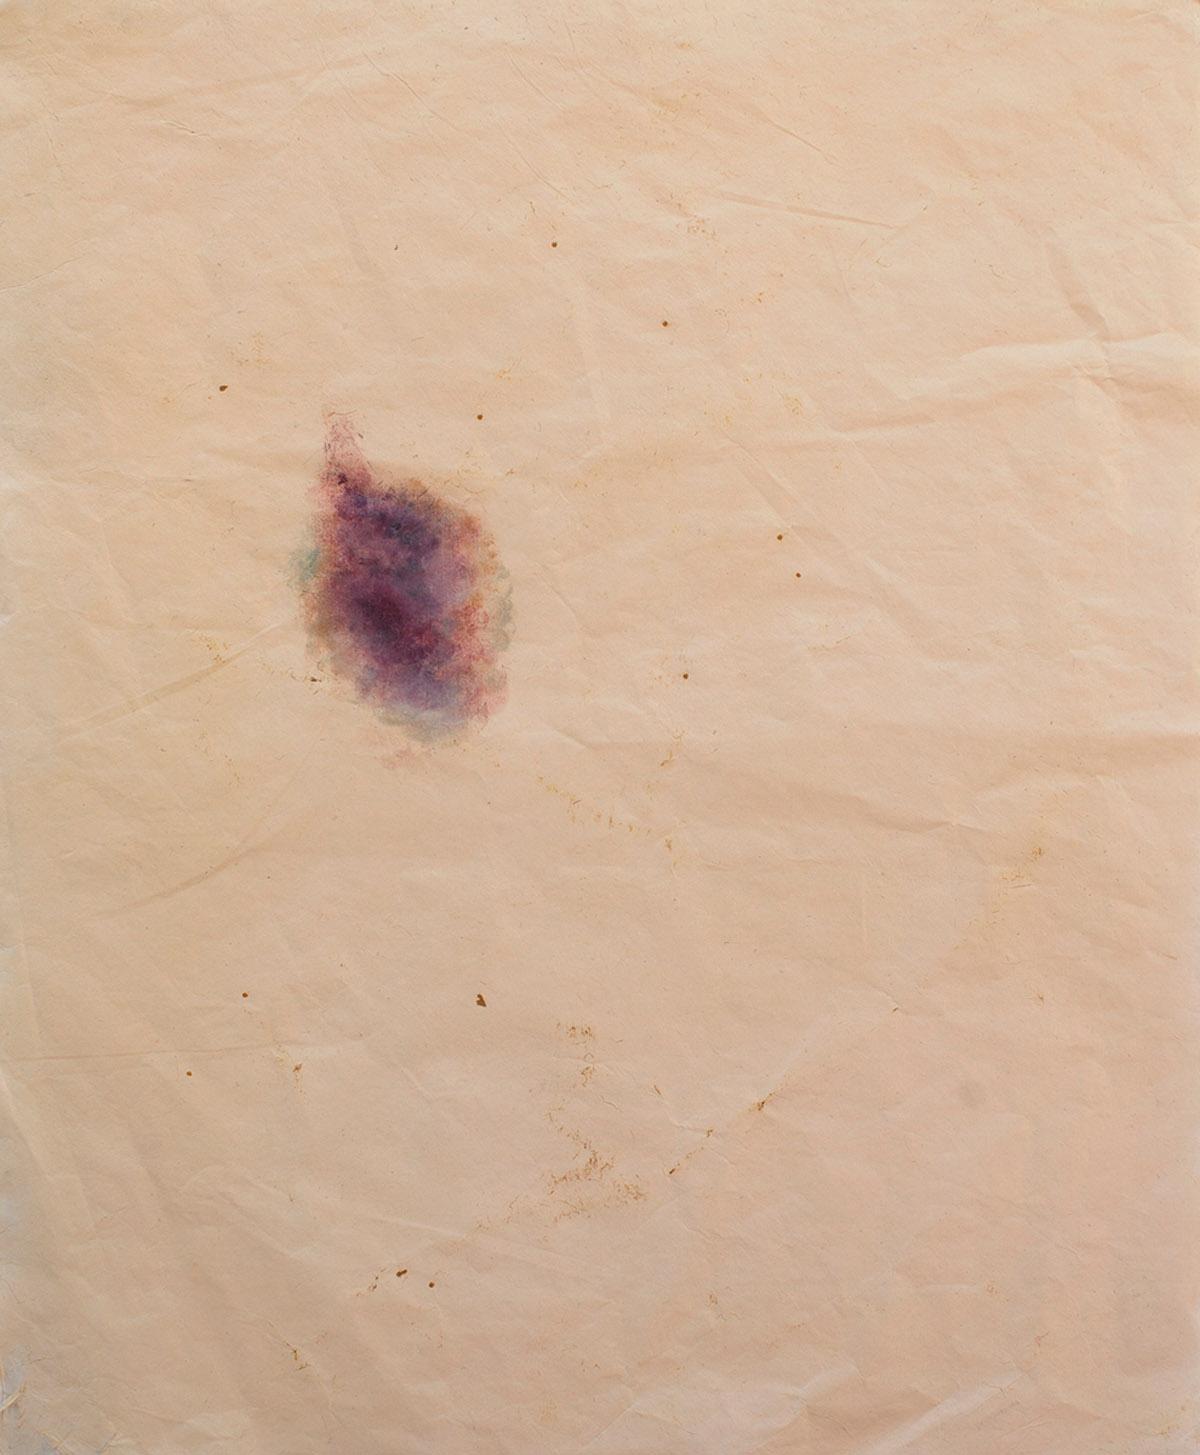 Abby Bullard Figure 1 monotype, wax 16 x 20 inches ABU 001G.jpg